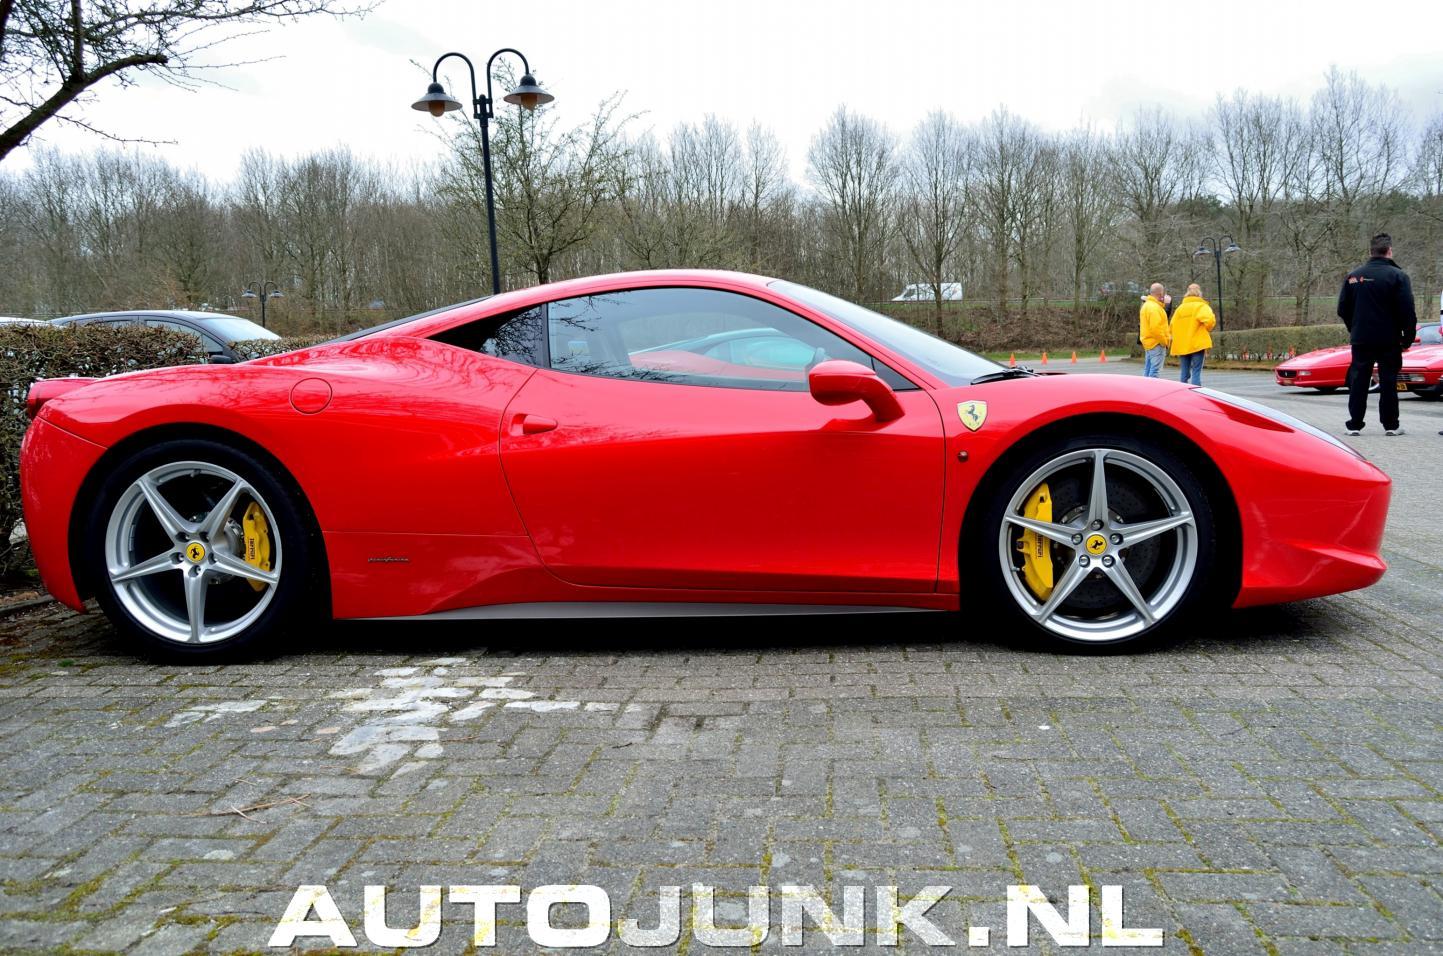 Ferrari 458 Italia Foto S 187 Autojunk Nl 138753